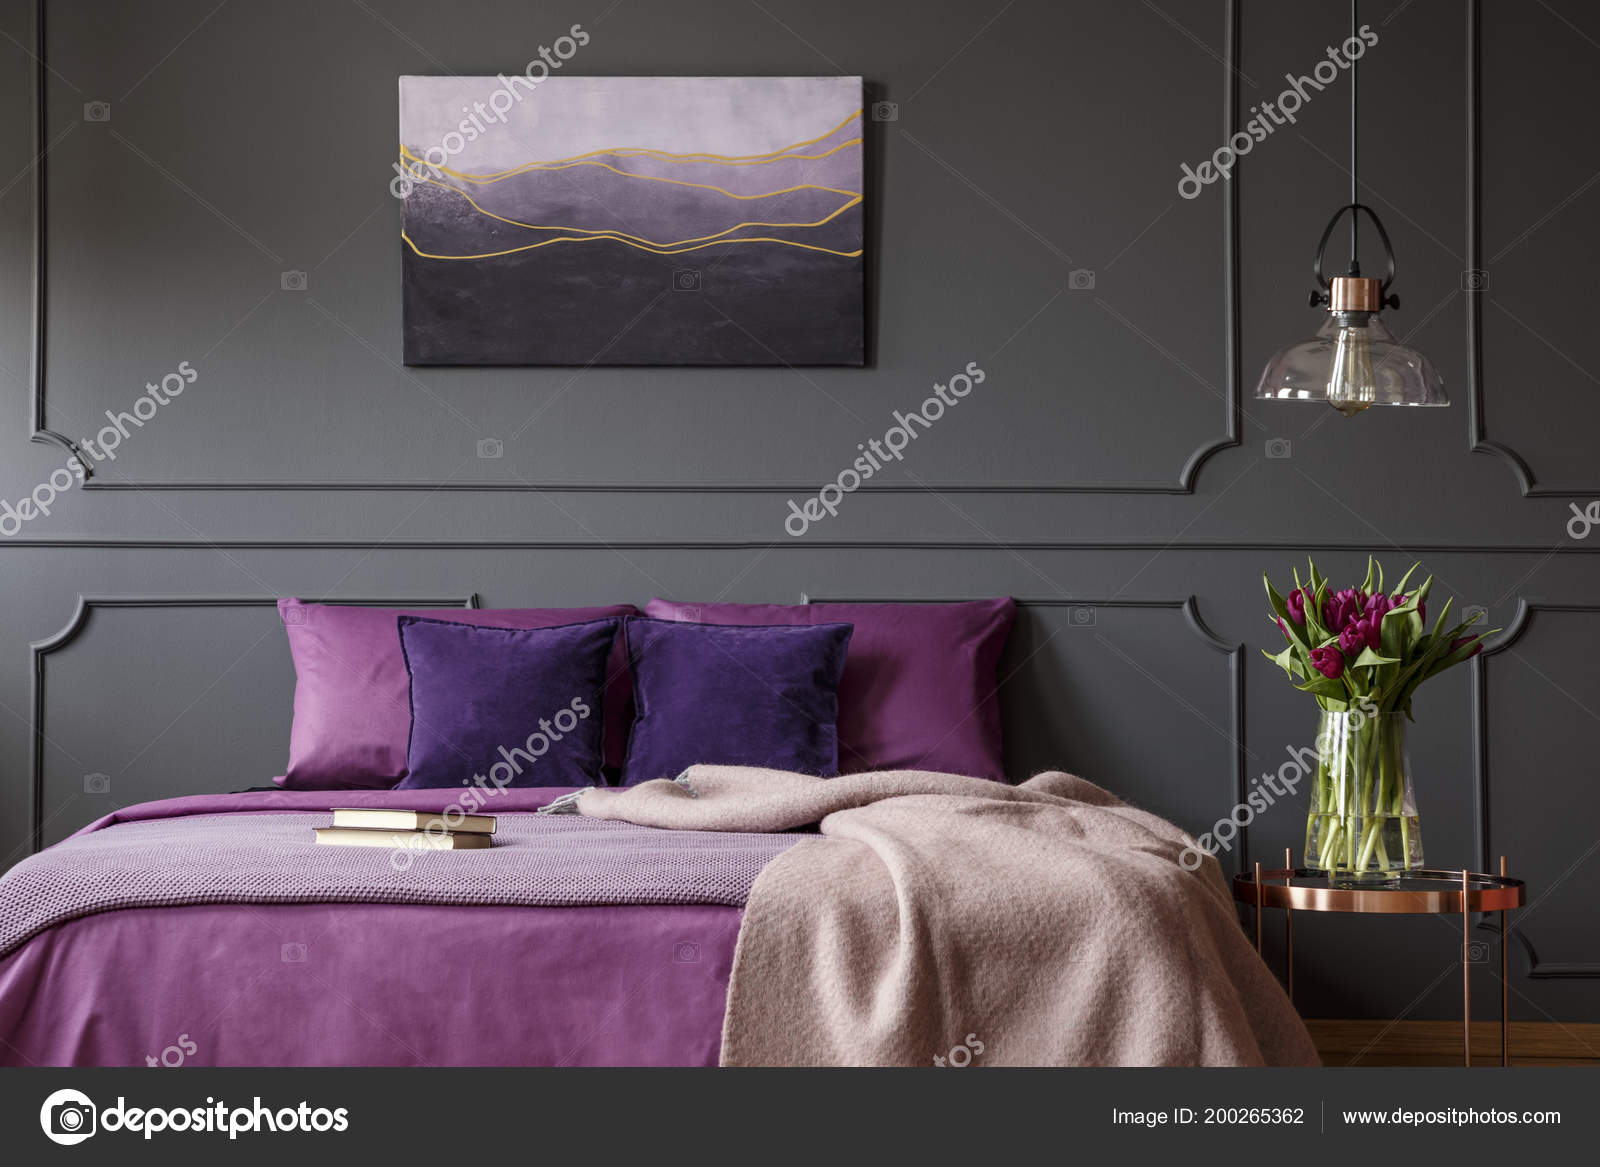 Paarse Accessoires Slaapkamer : Deken paarse bed naast tabel met bloemen slaapkamer interieur met